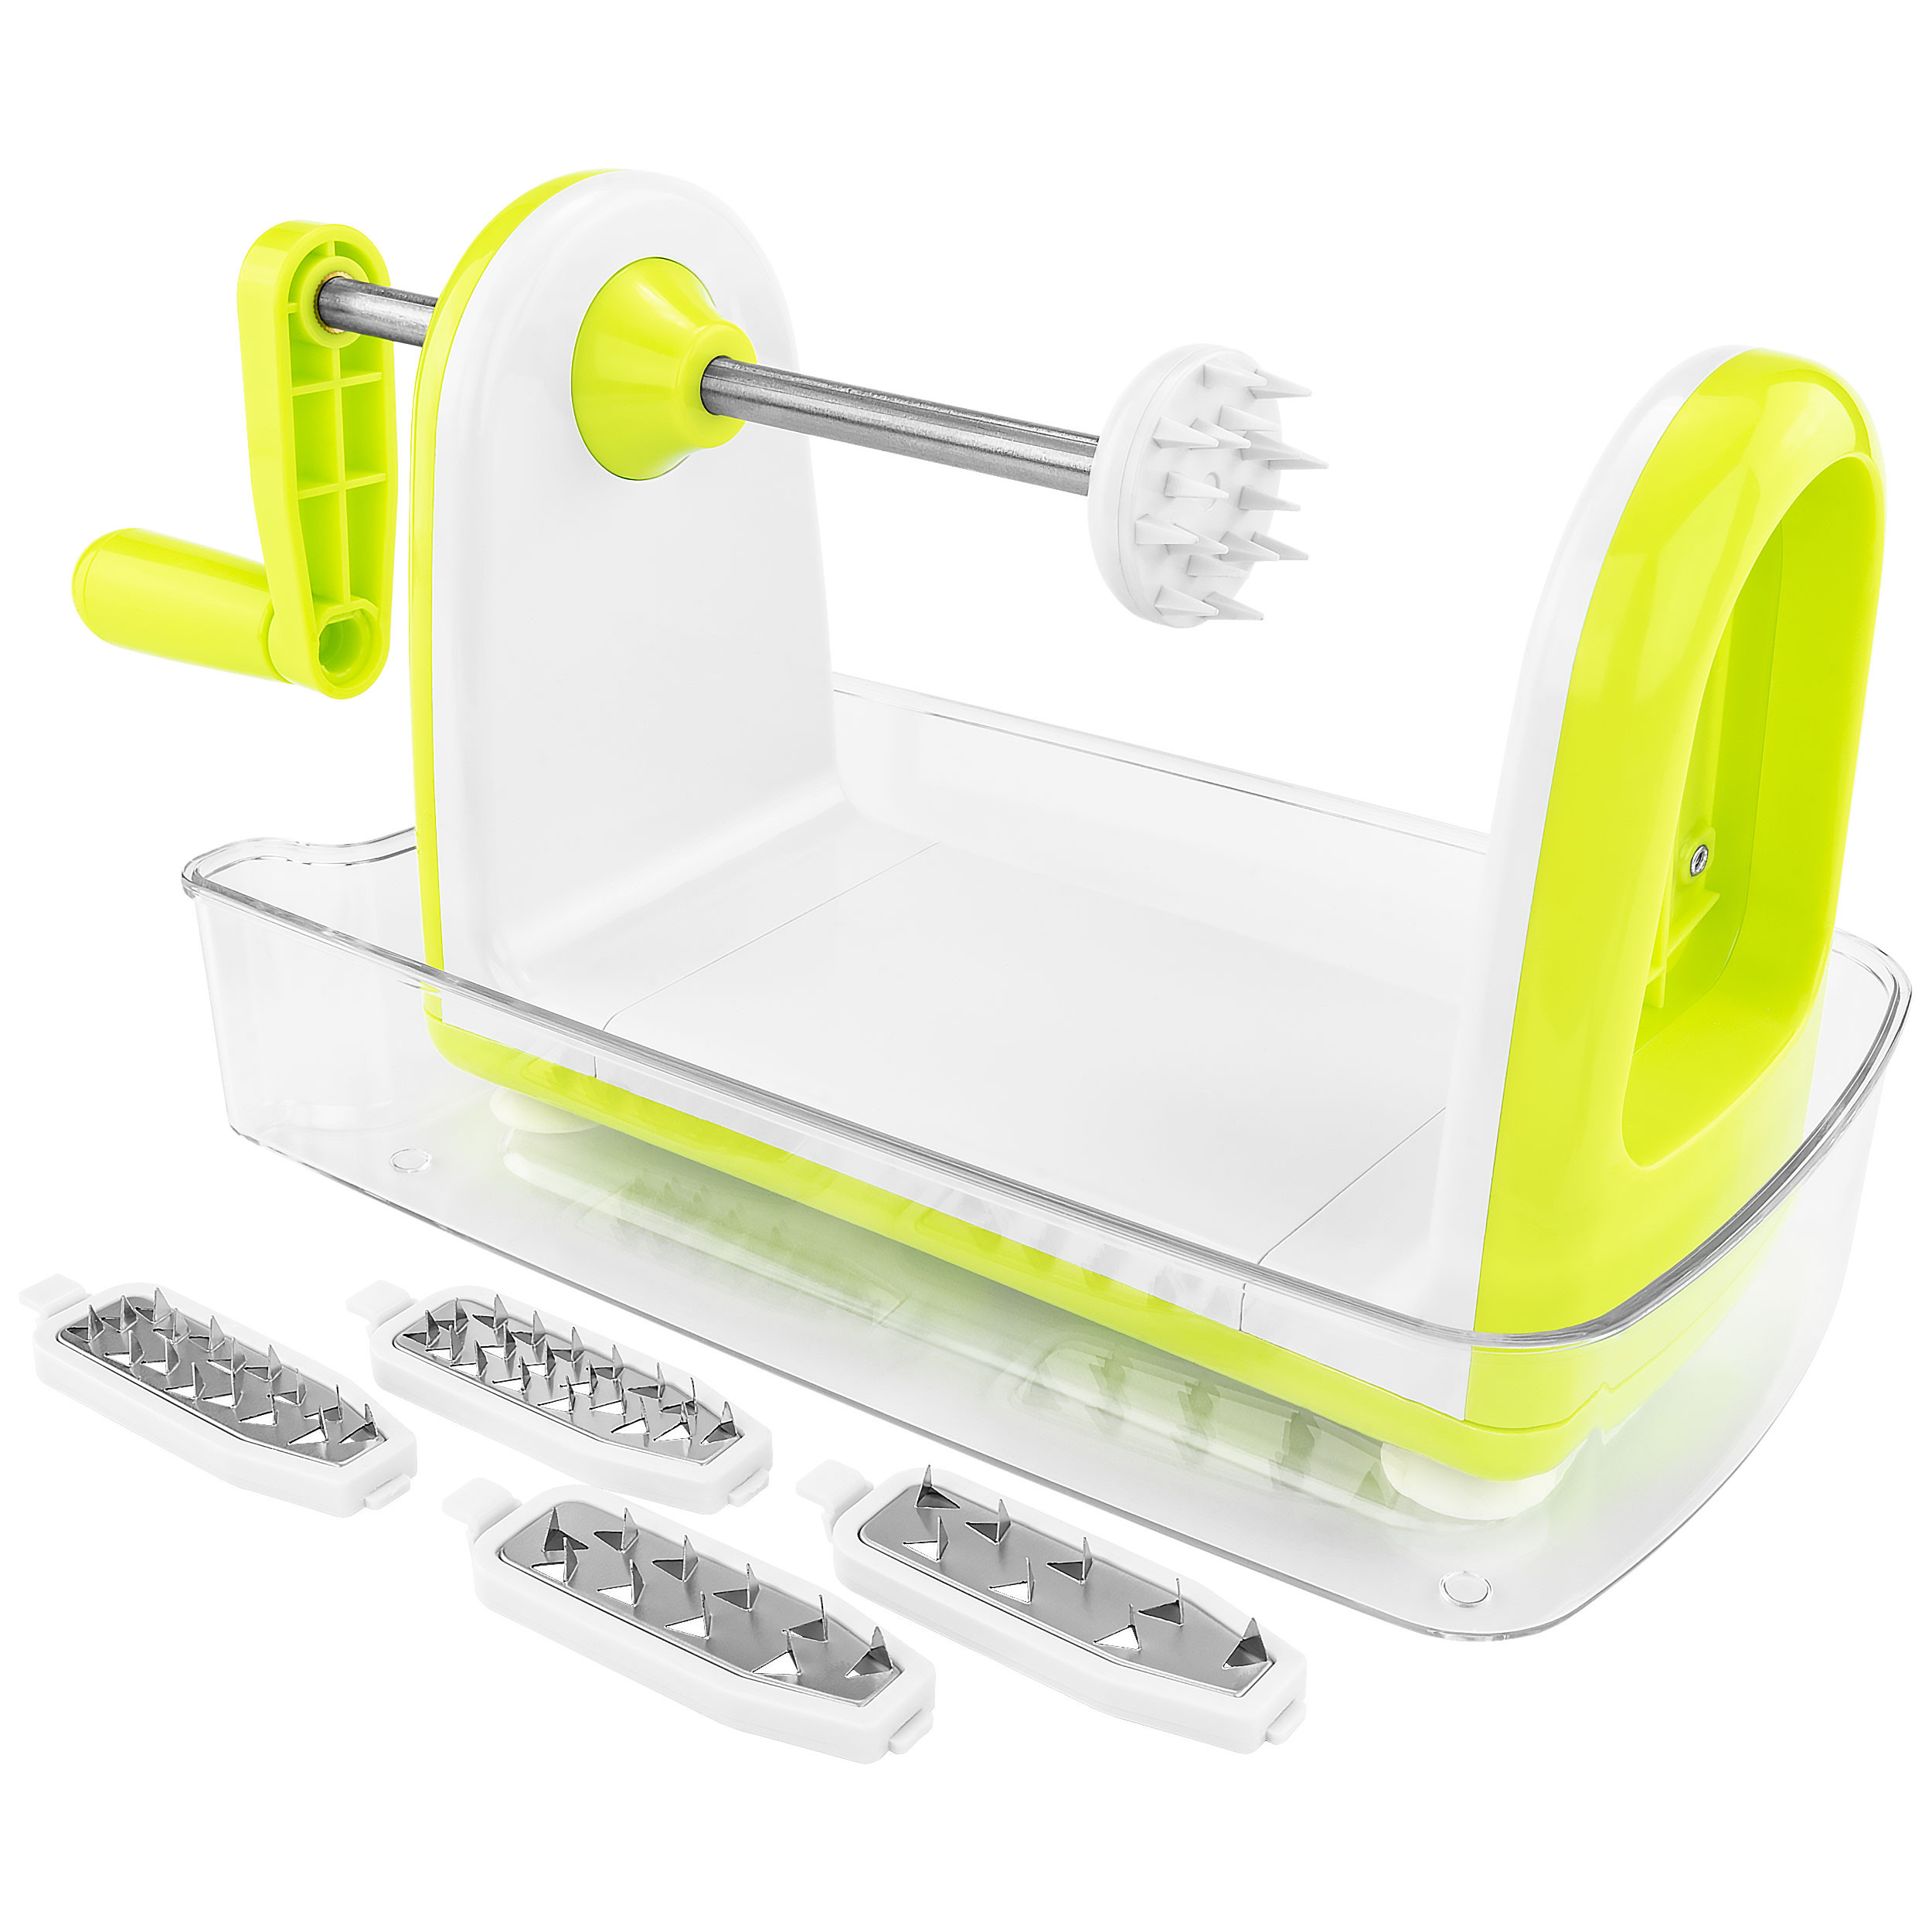 5 Blade Spiral Table Top Fruit Vegetable Slicer Zucchini Spaghetti Noodle Maker